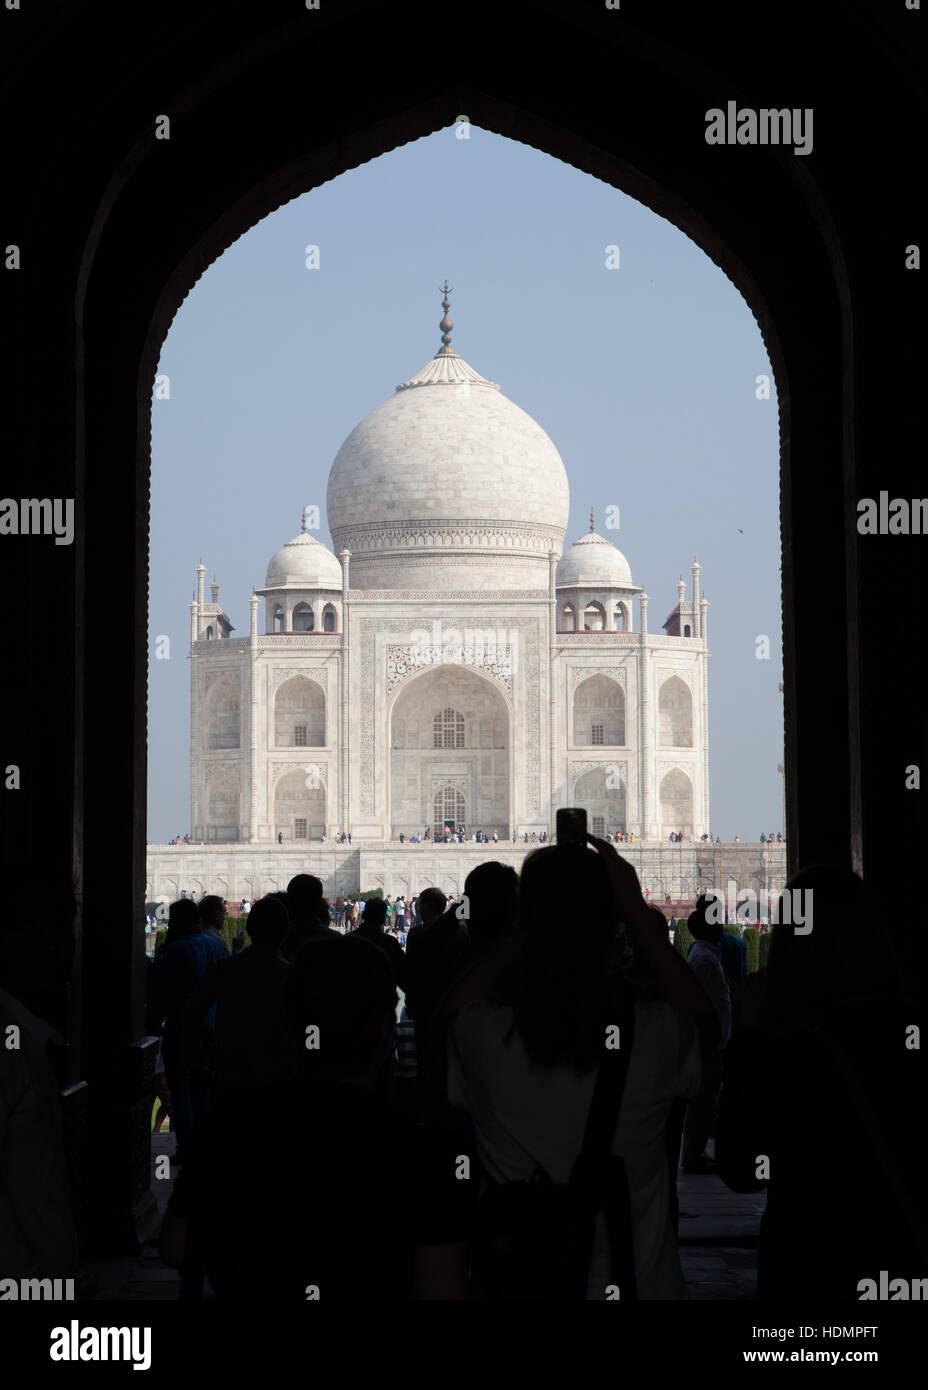 Das Taj Mahal-Mausoleum, Blick durch Eingangstor, Uttar Pradesh, Indien Stockbild